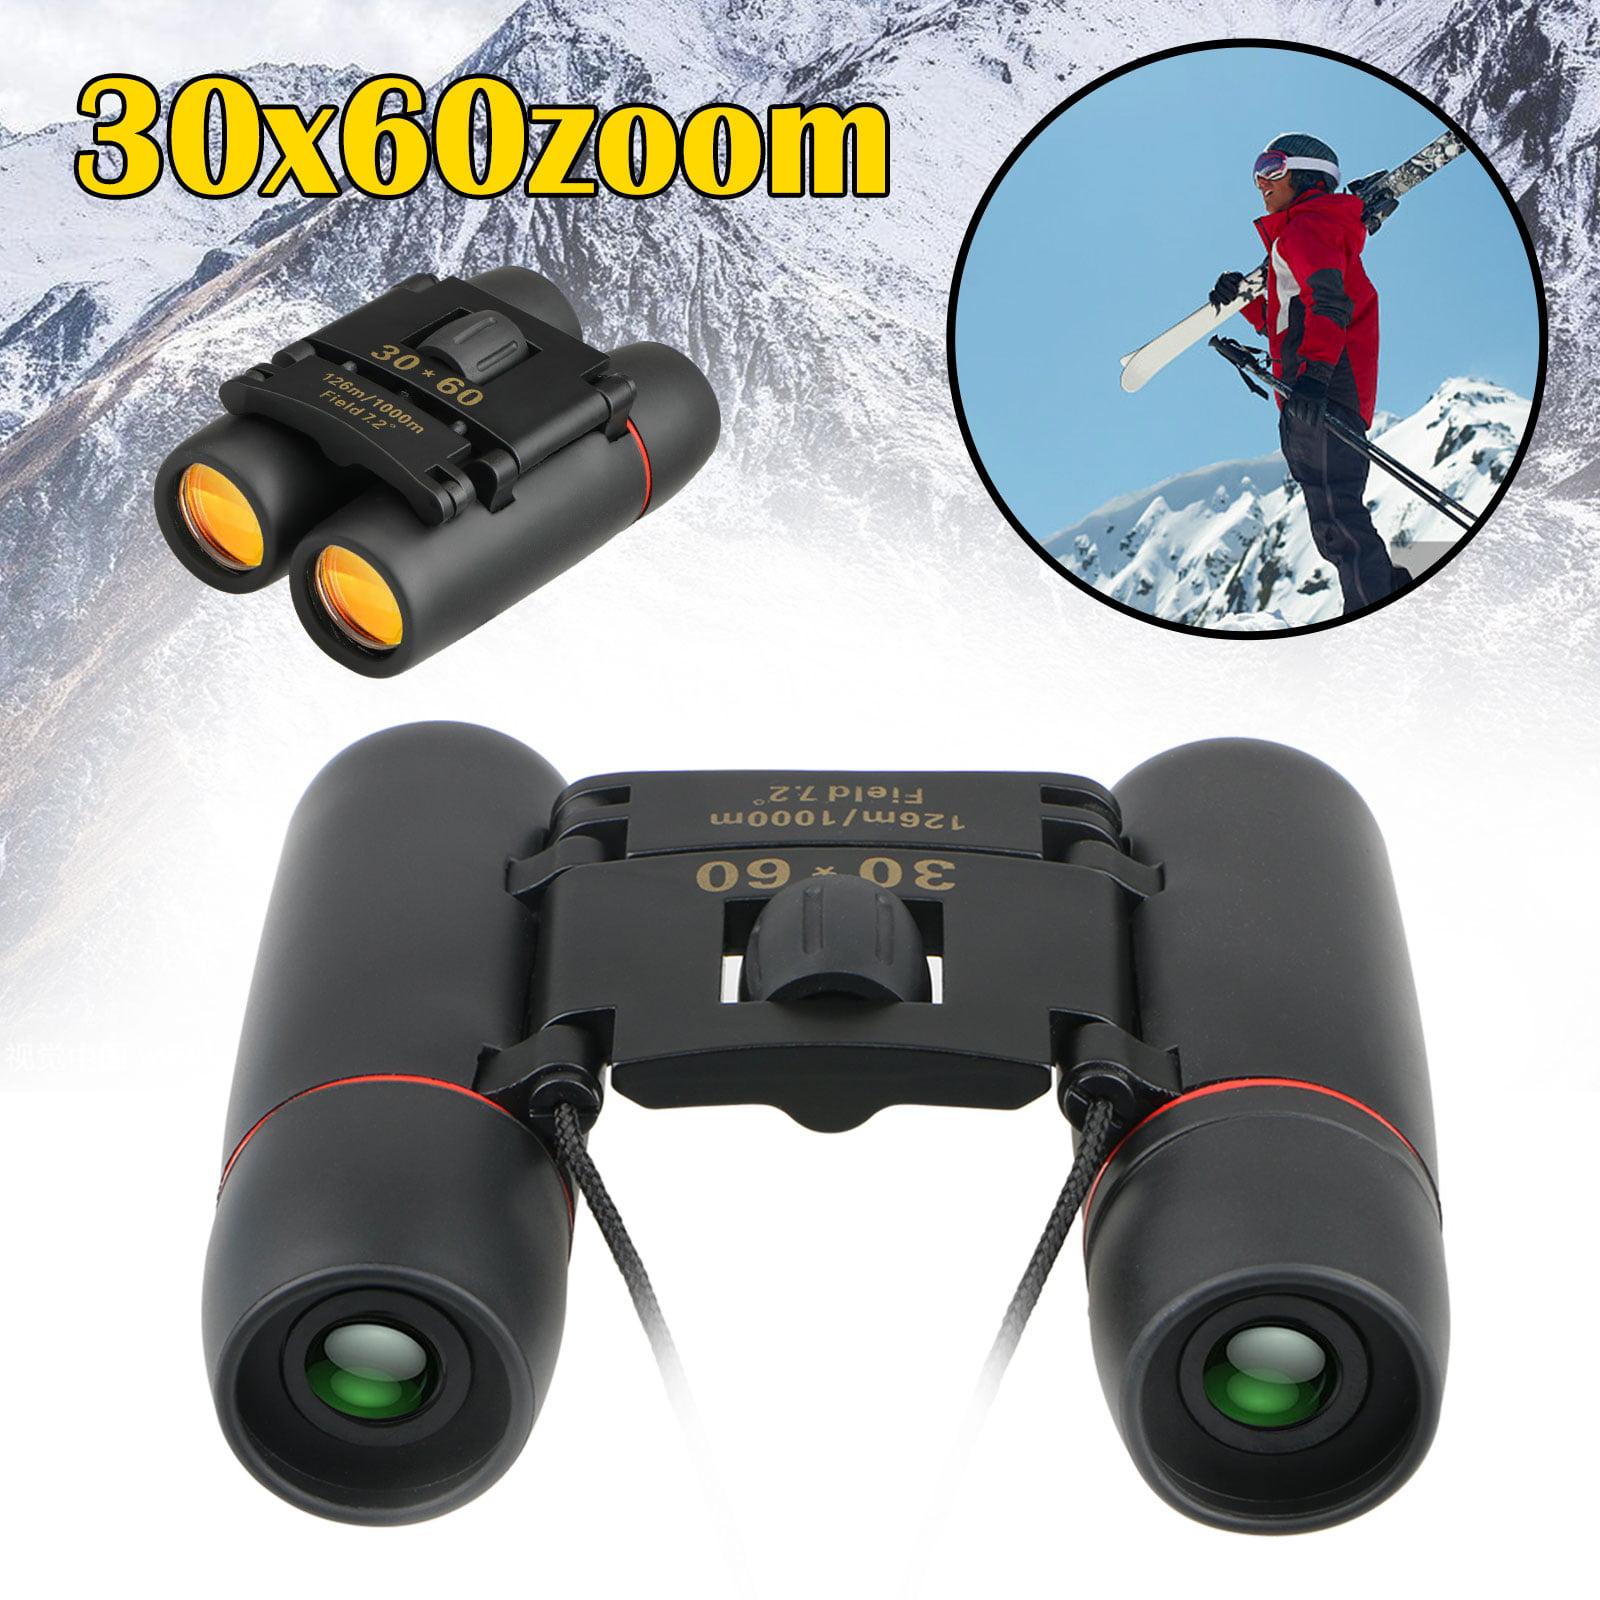 Kids Binoculars, 30x60 Mini Binoculars Folding Binoculars Compact Binoculars for Kids Waterproof Telescope for Bird Watching, Football Safari Sightseeing, Camping and Travel